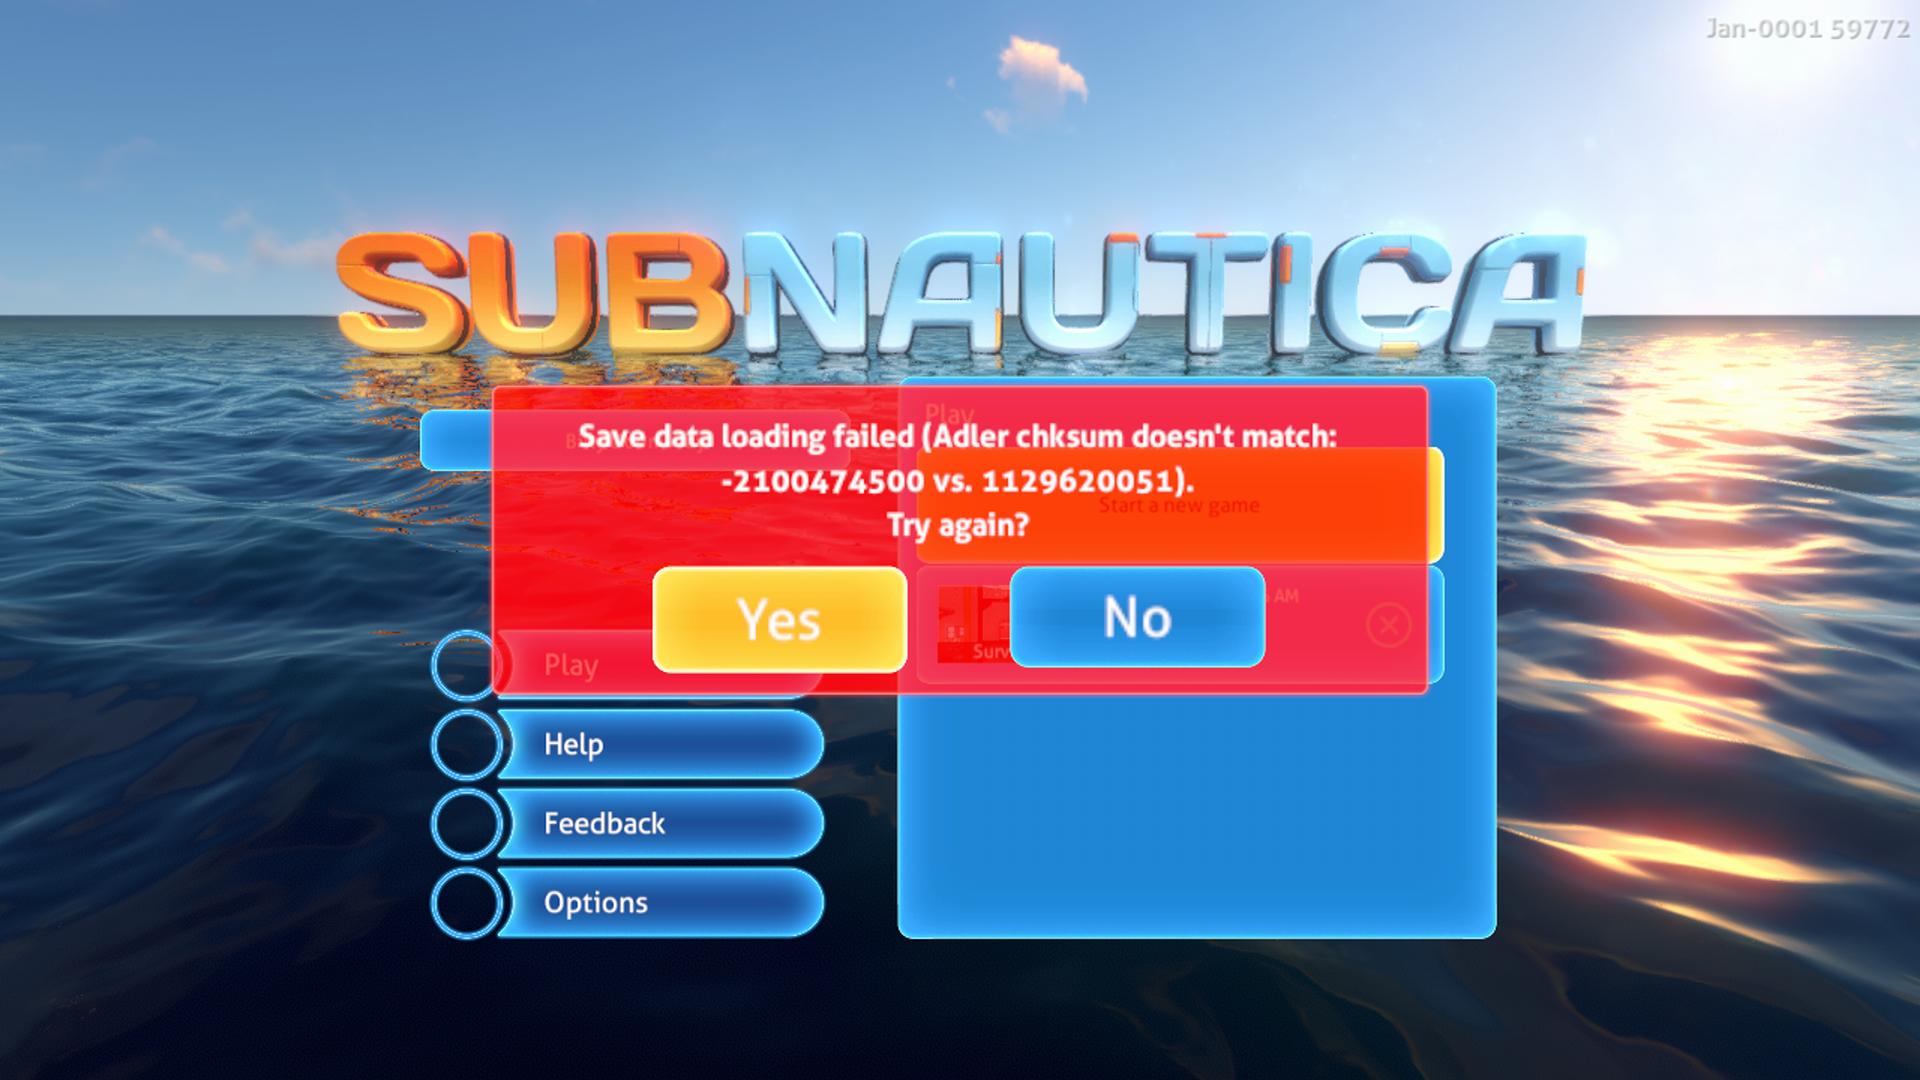 Subnautica Xbox Save/Load Hotfix - Subnautica